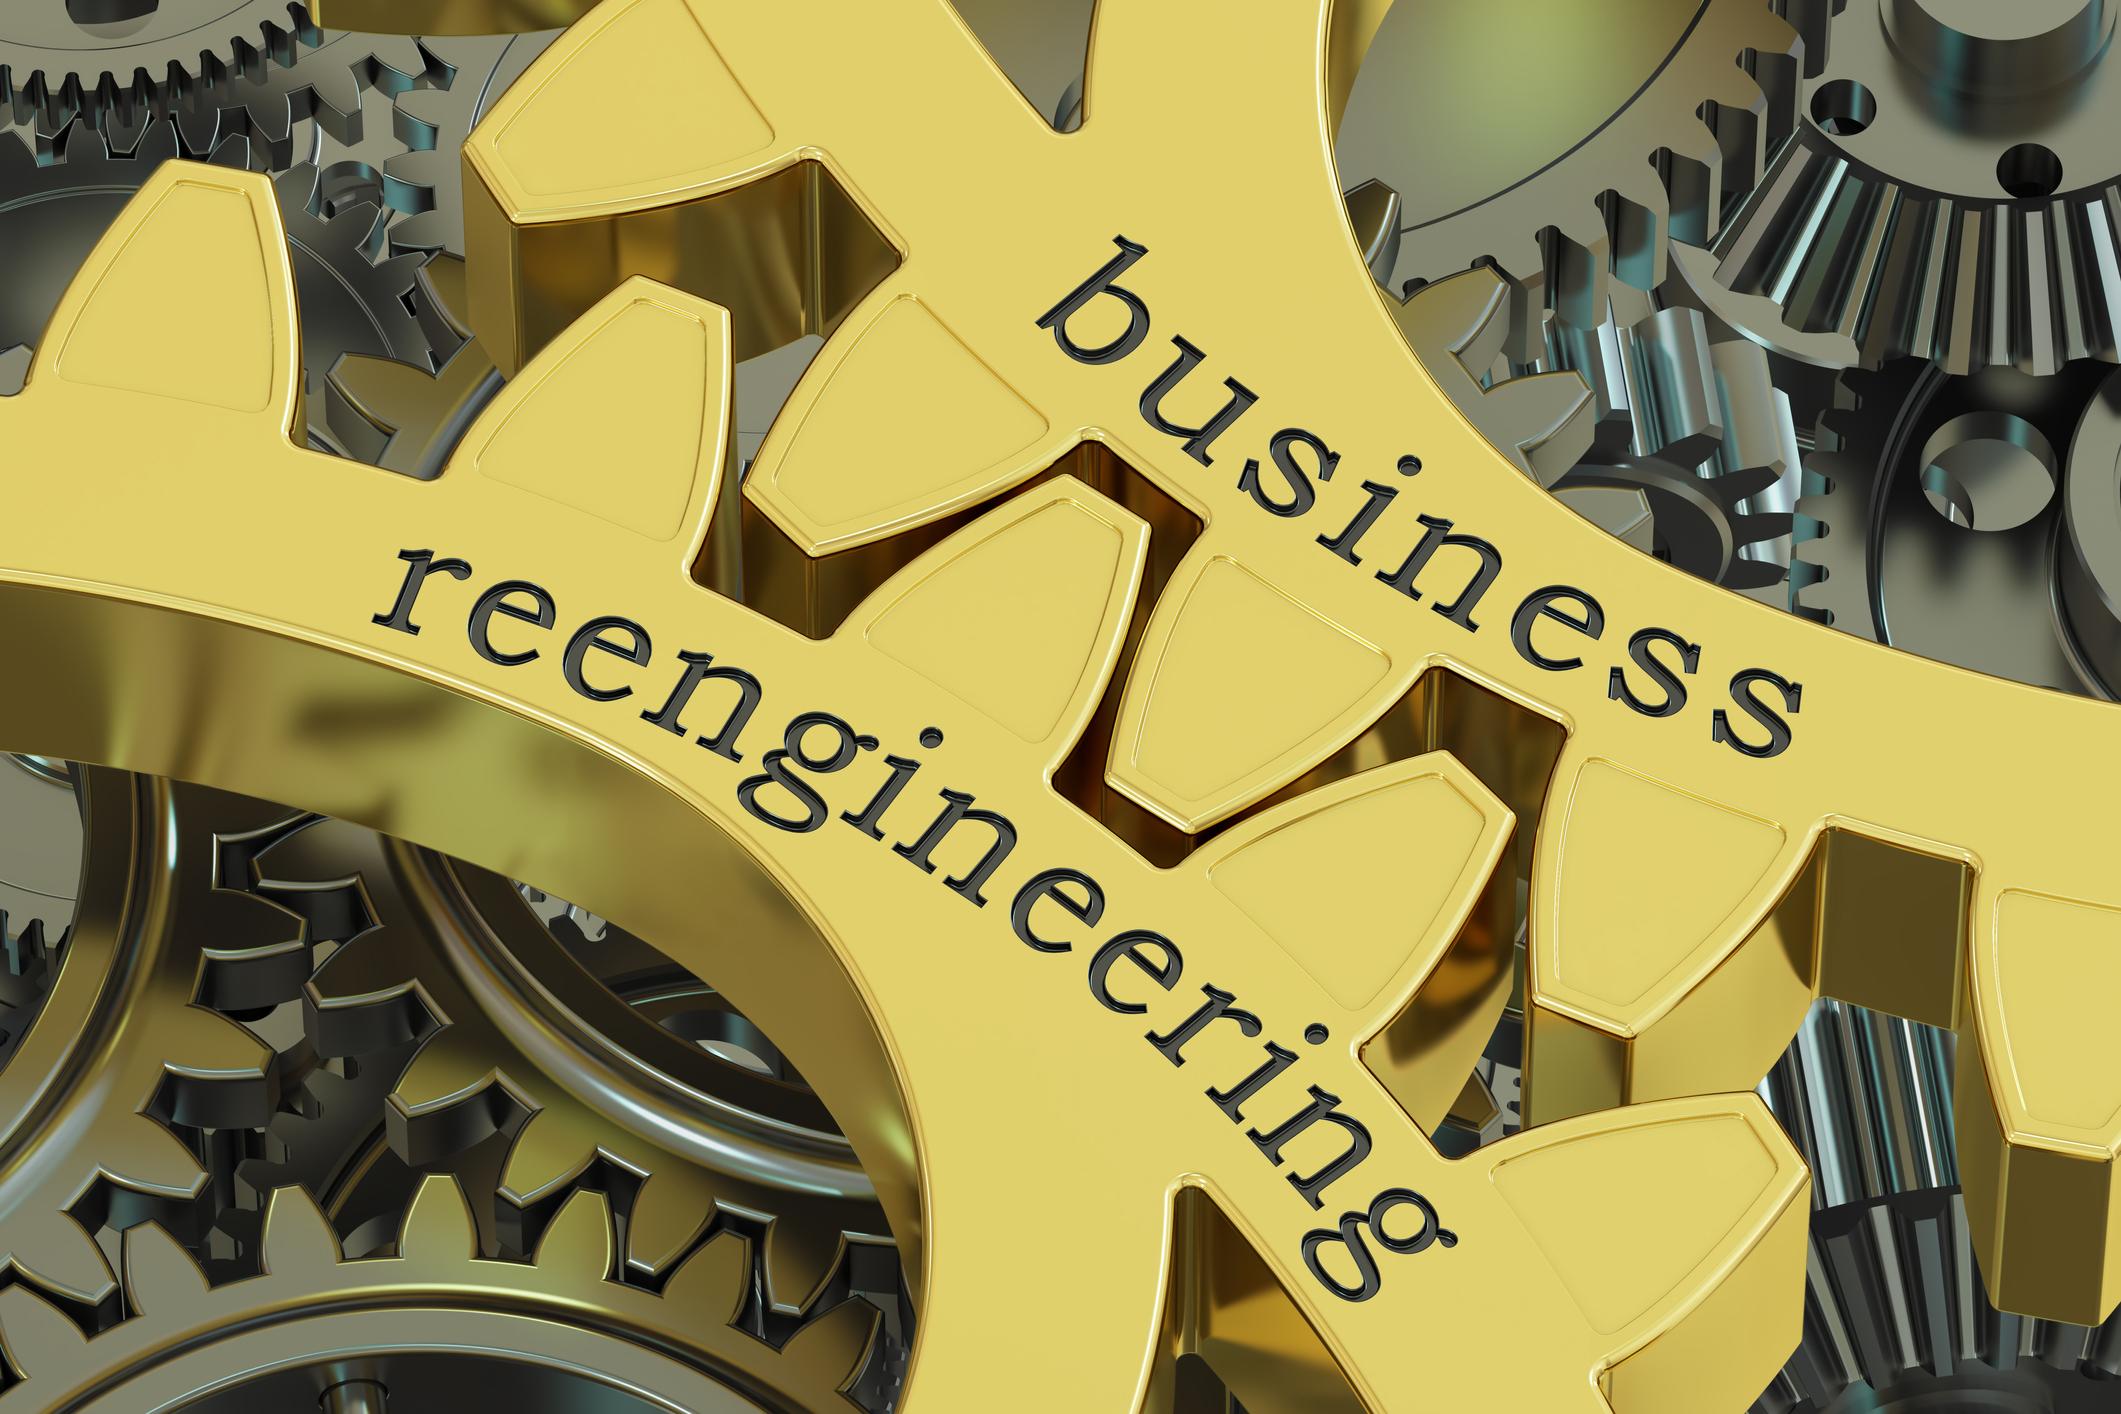 Business reengineering written on a gear.